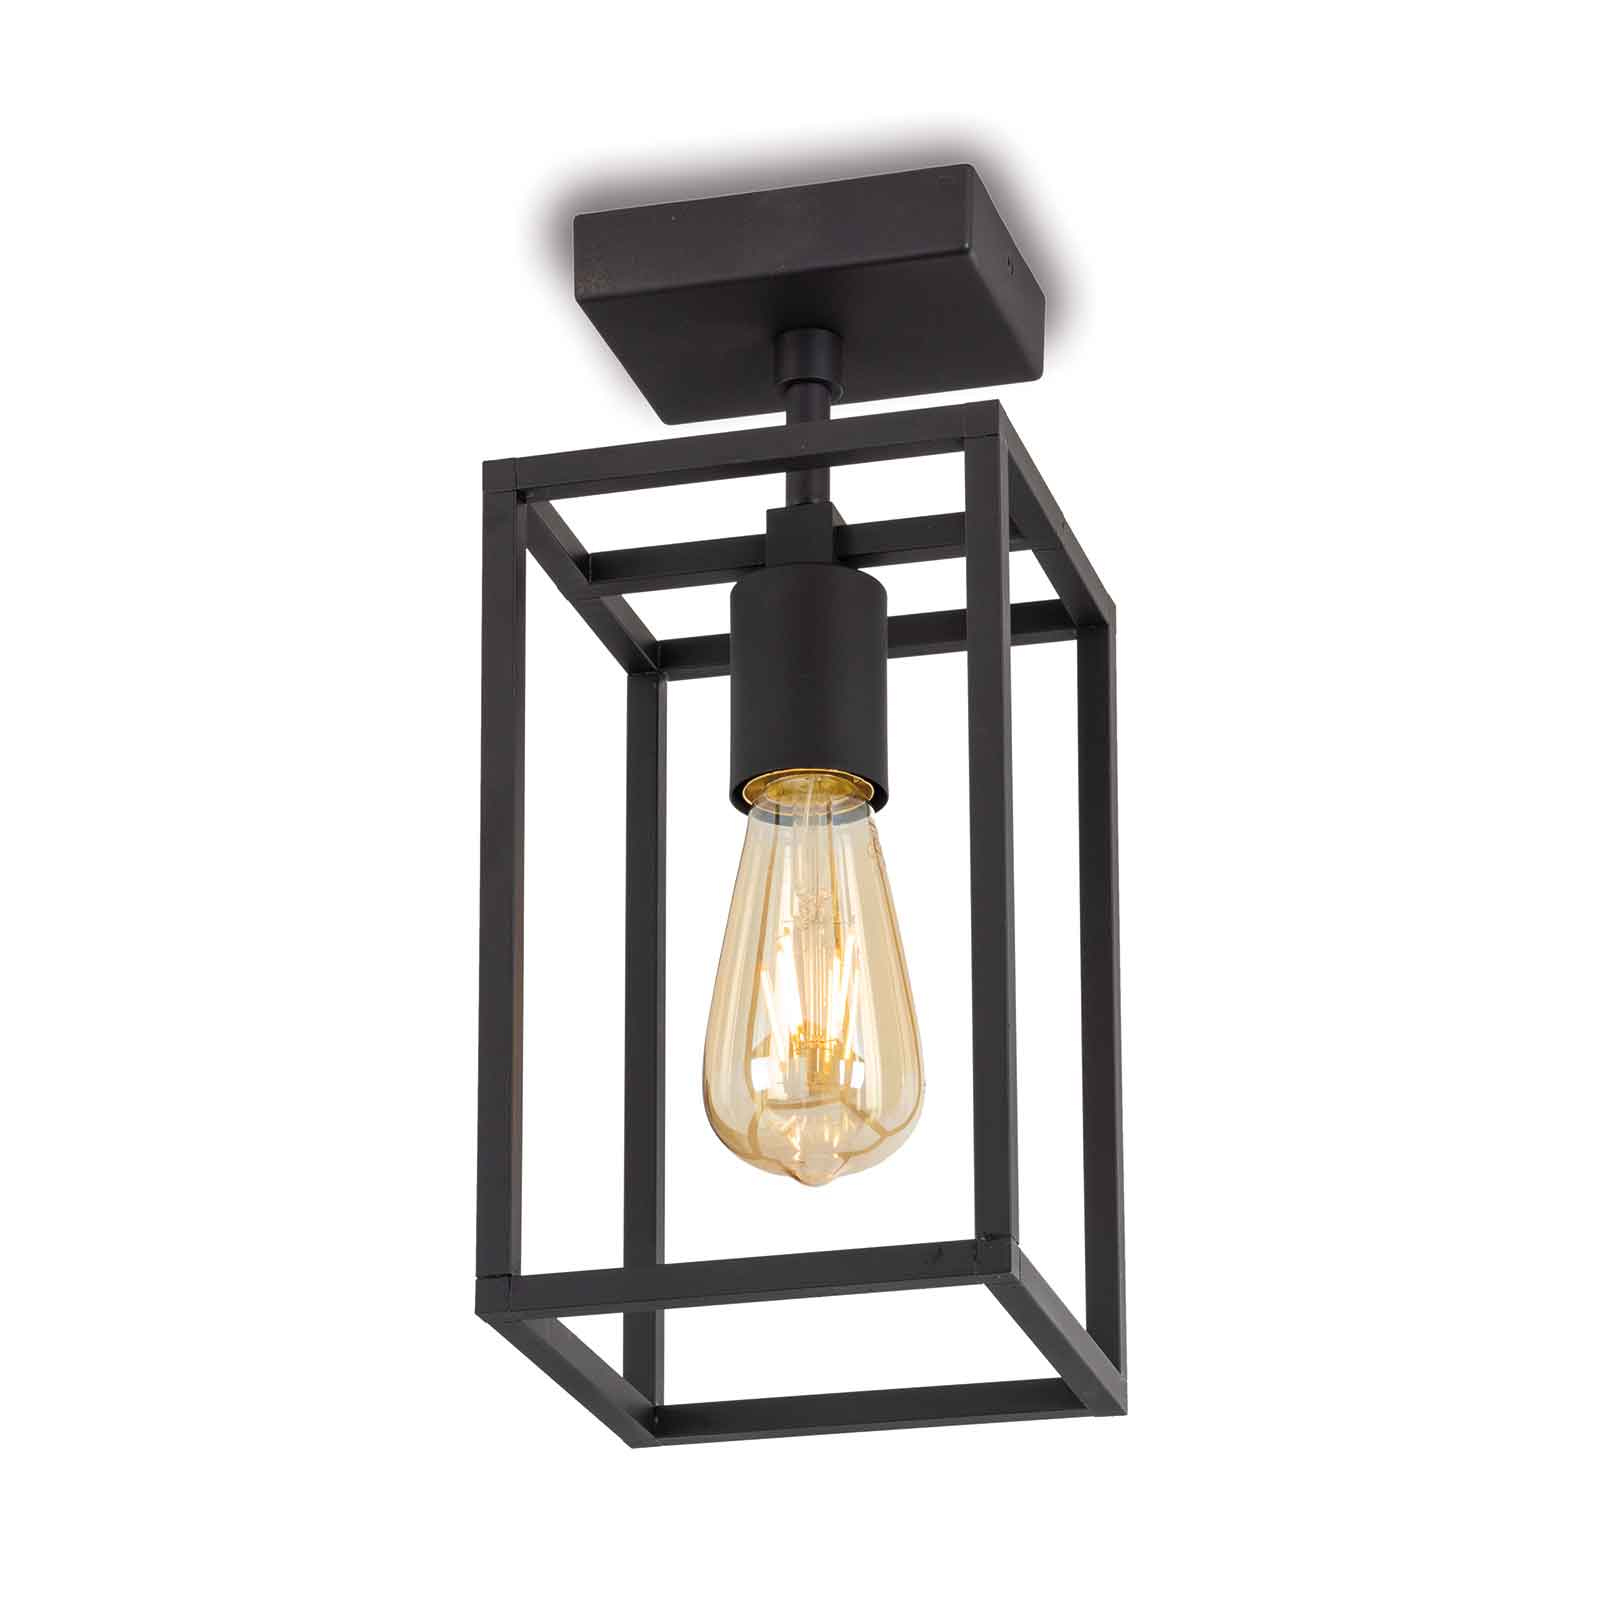 Lampa sufitowa Cubic³ 3391 czarna